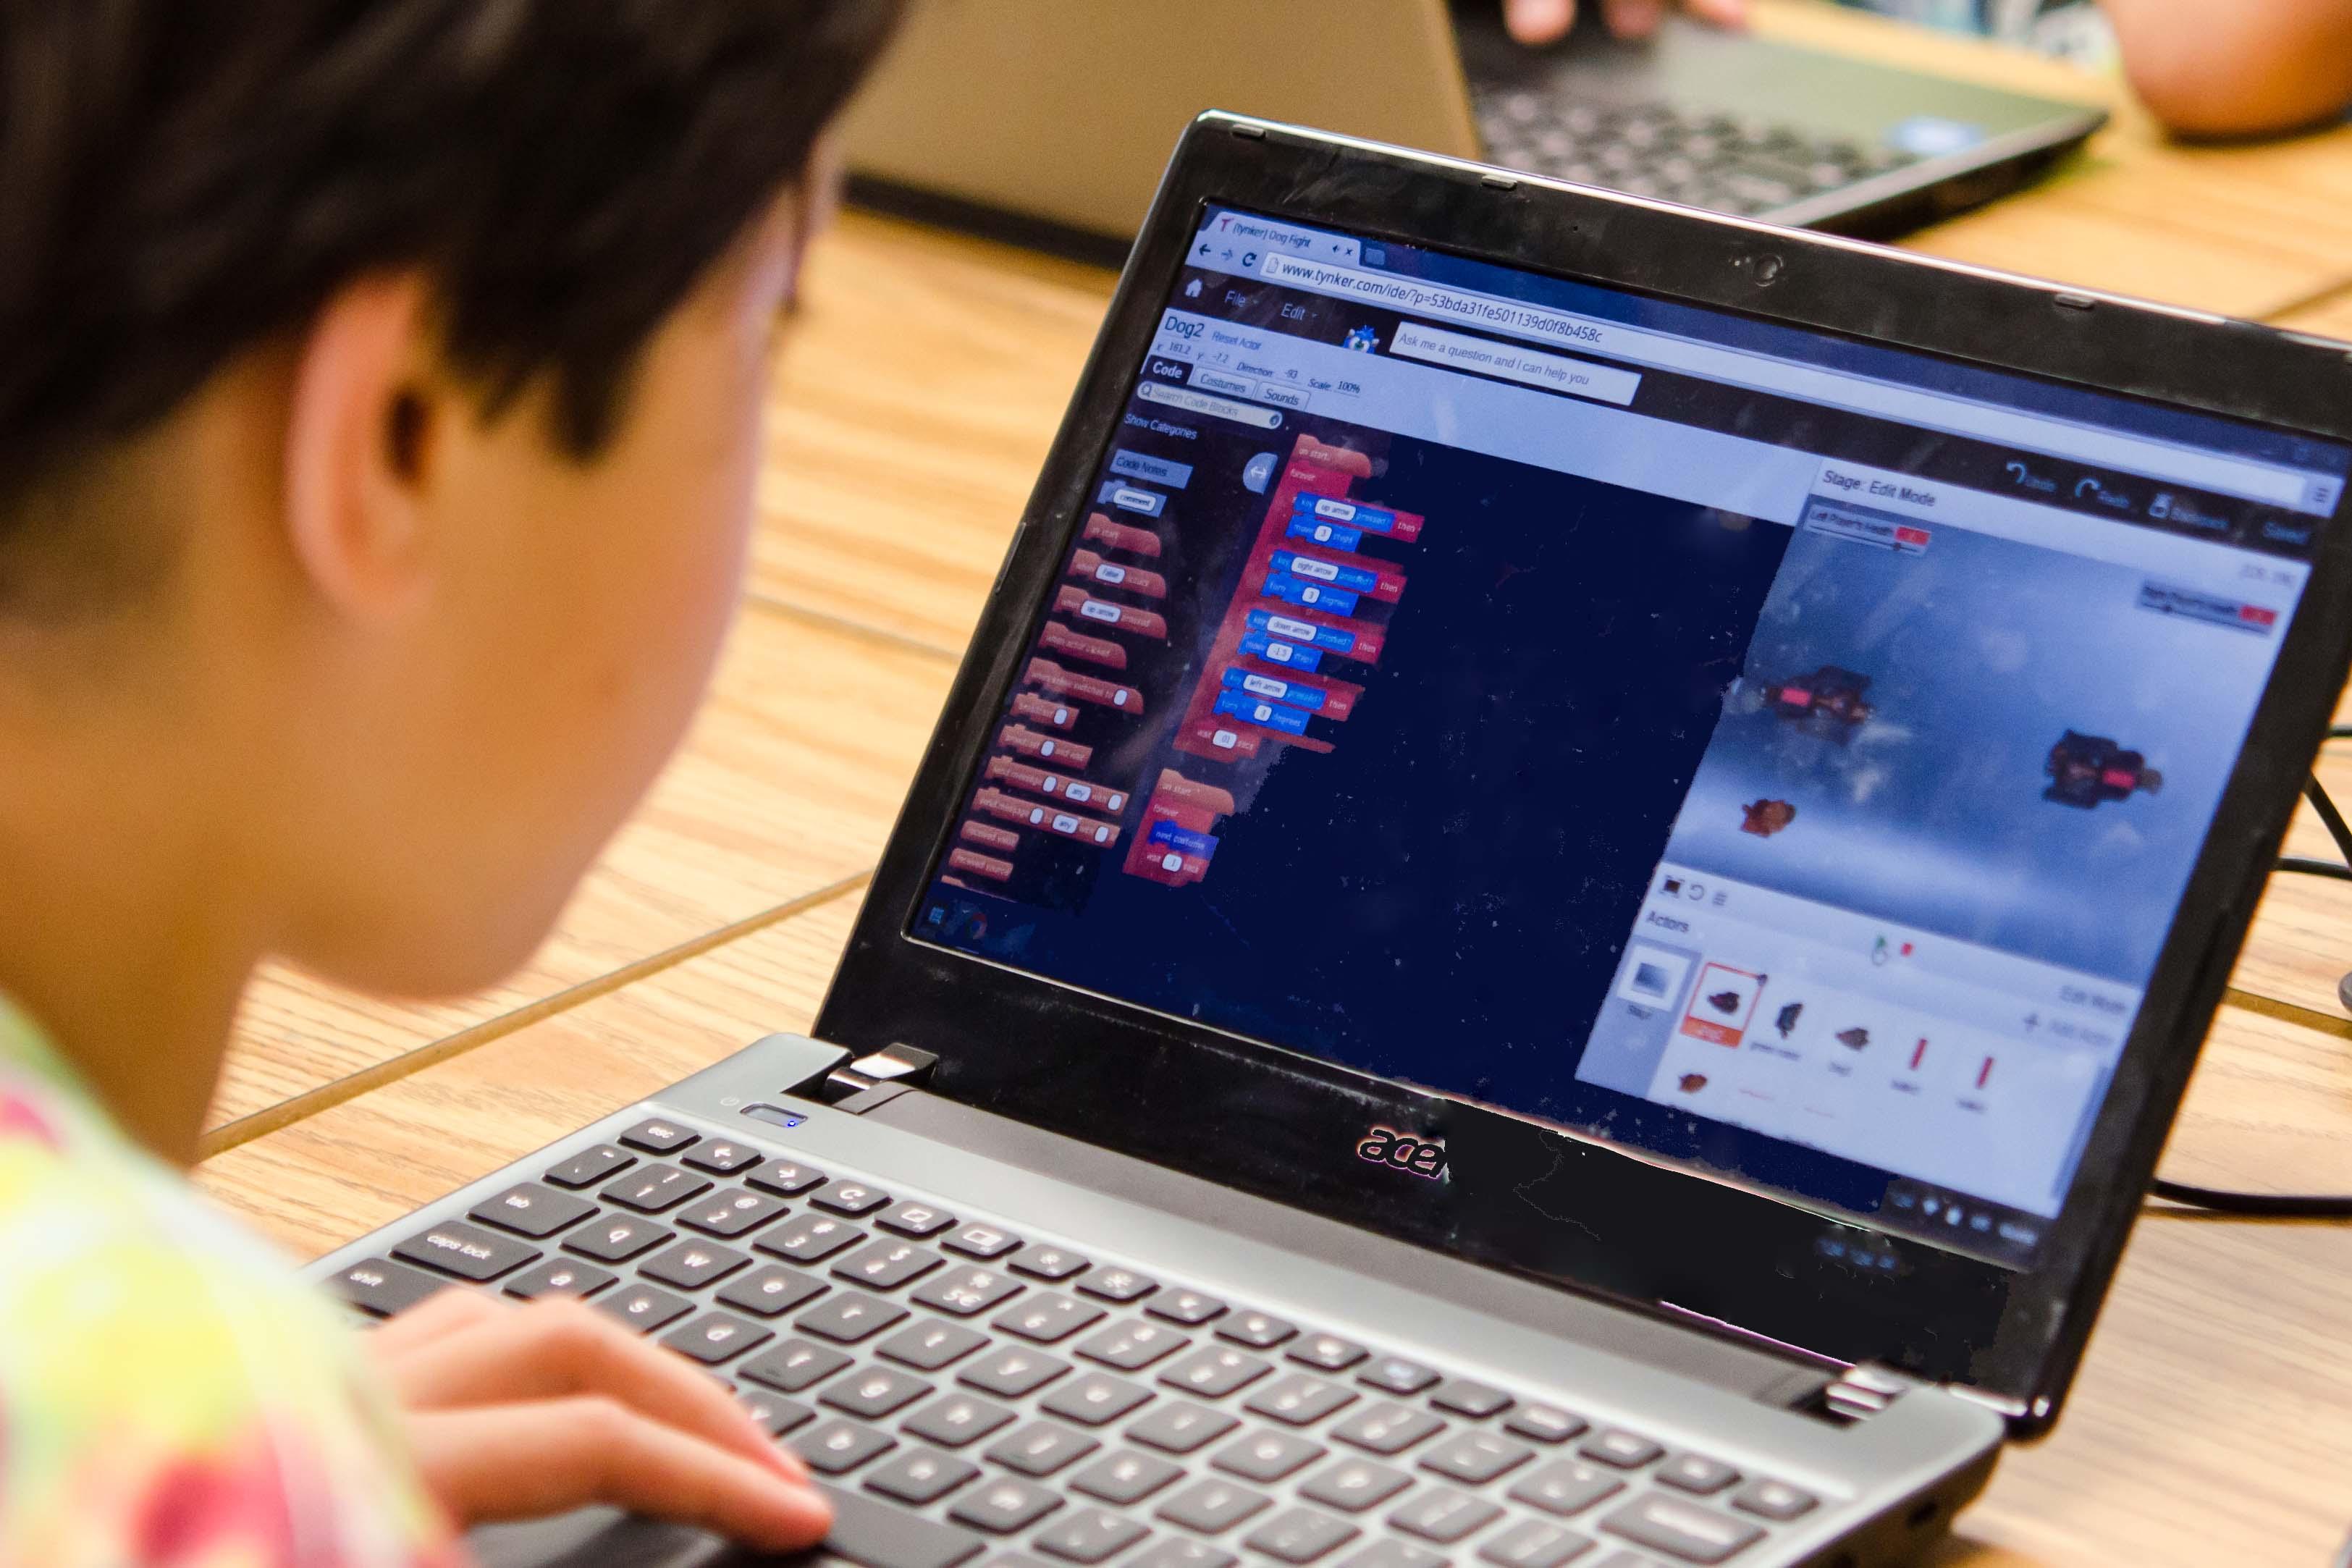 Worksheet Learning Programming For Kids learning to code develops creativity in kids tynker blog dsc 0013 edited cropped